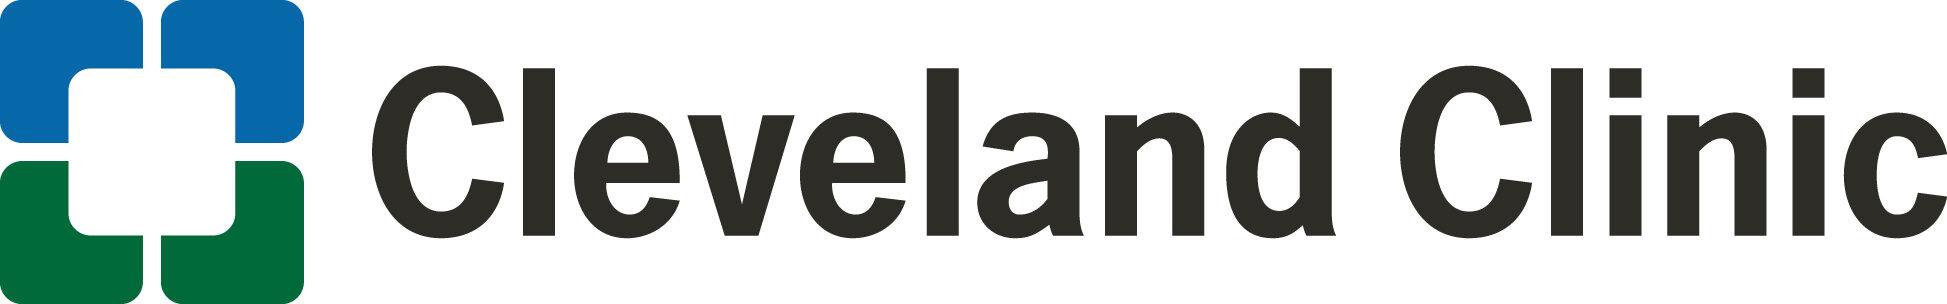 Cleveland Clinic (2).jpg